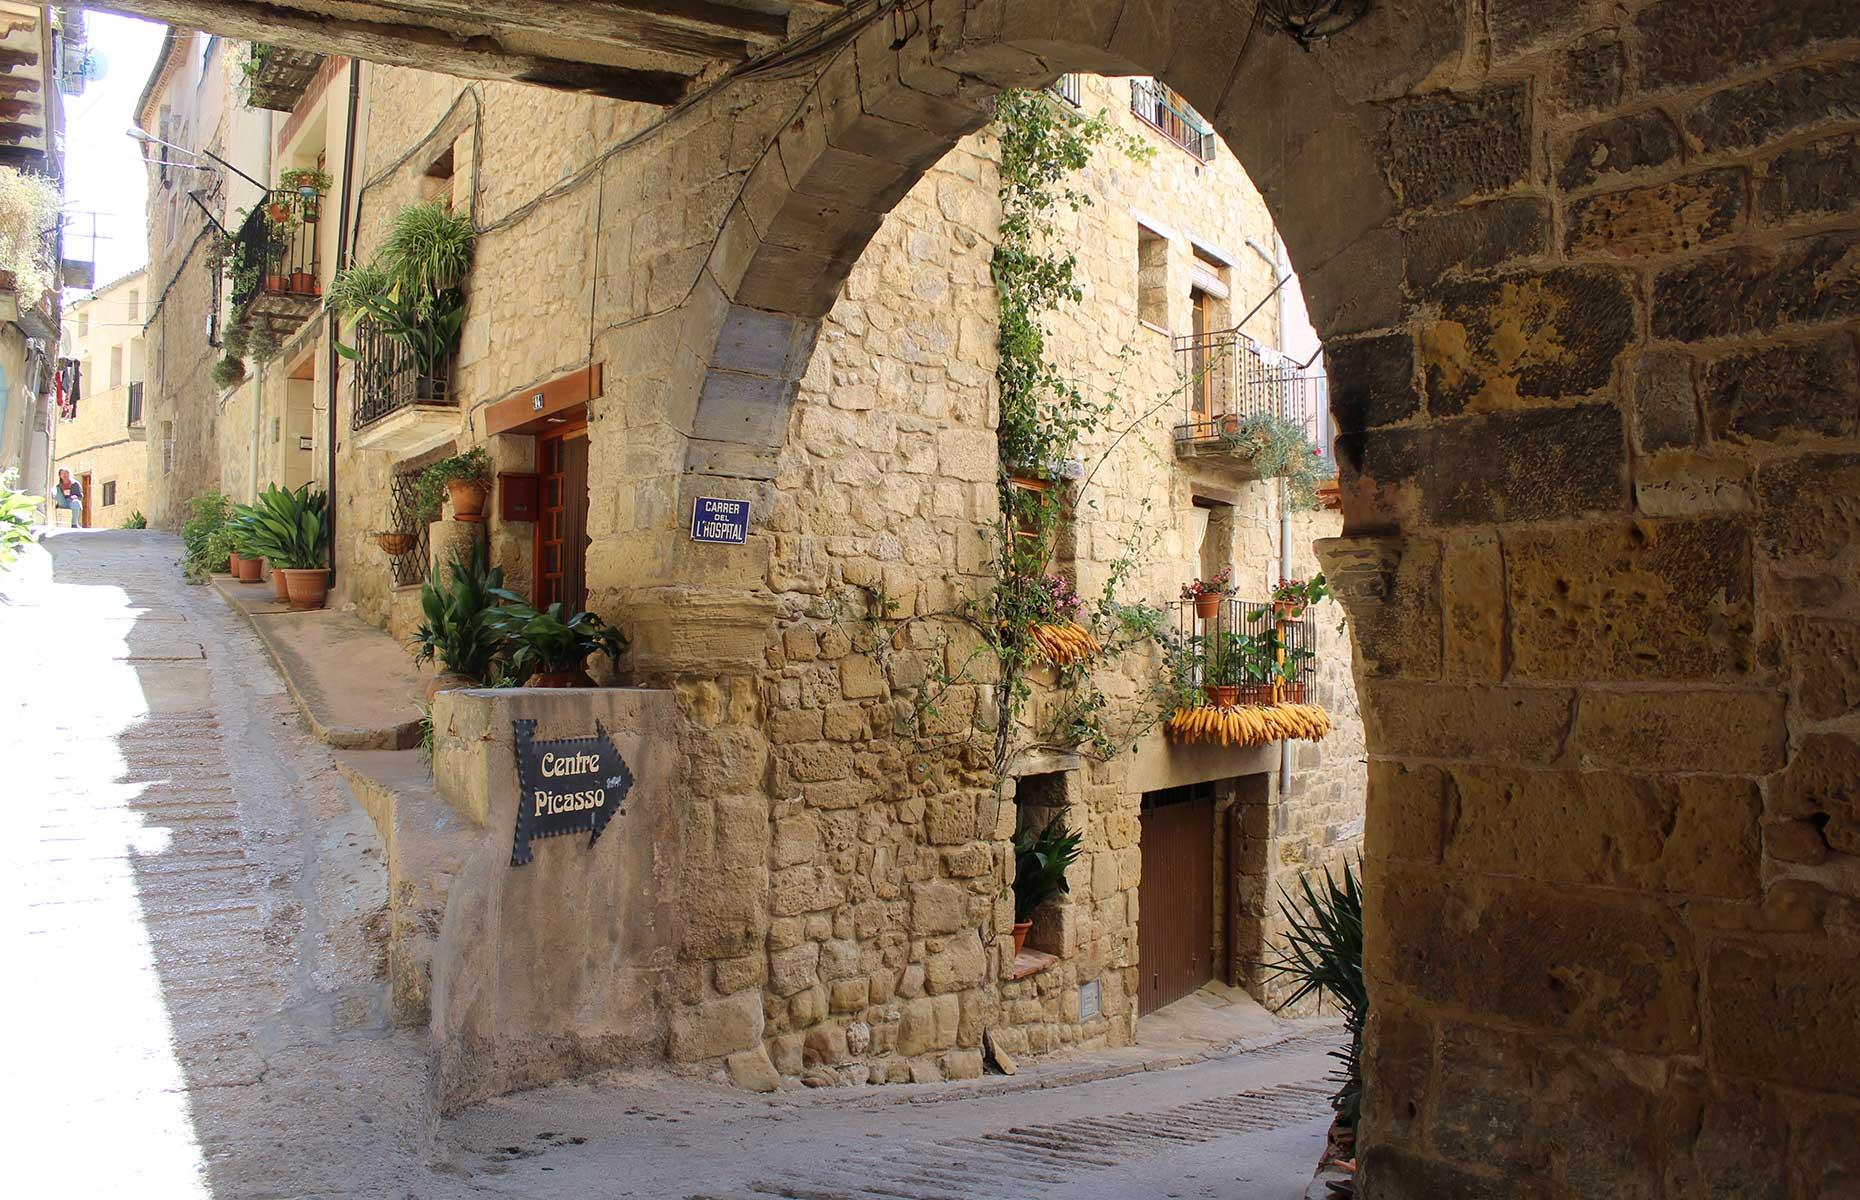 Horta de Sant Joan (Images: Besides the Obvious/Shutterstock)